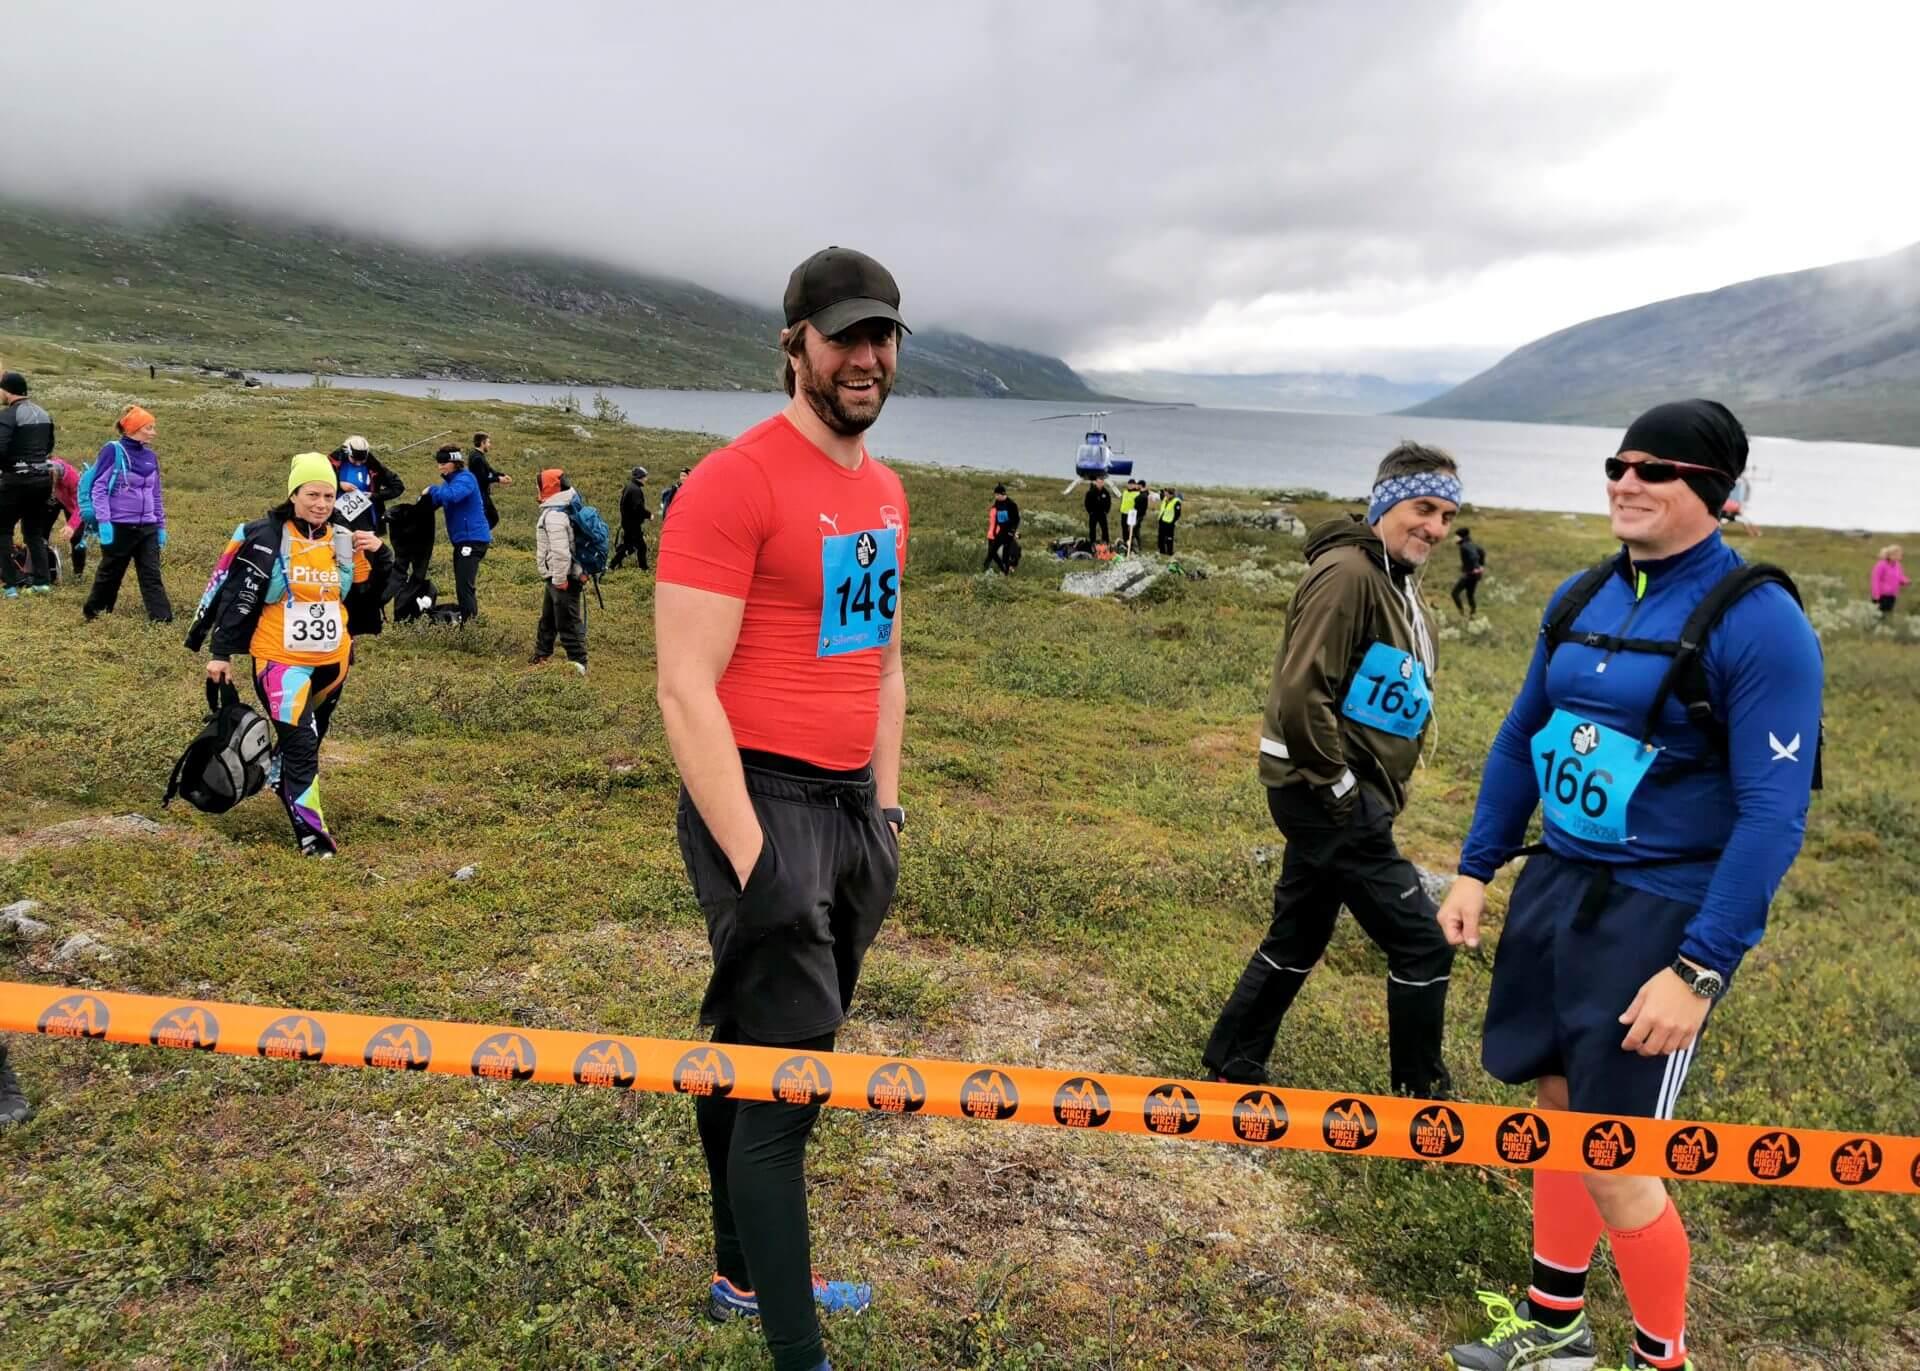 Arctic Circle Race 2019 Polcirkelloppet Guijaure start 148 Frans Helamb